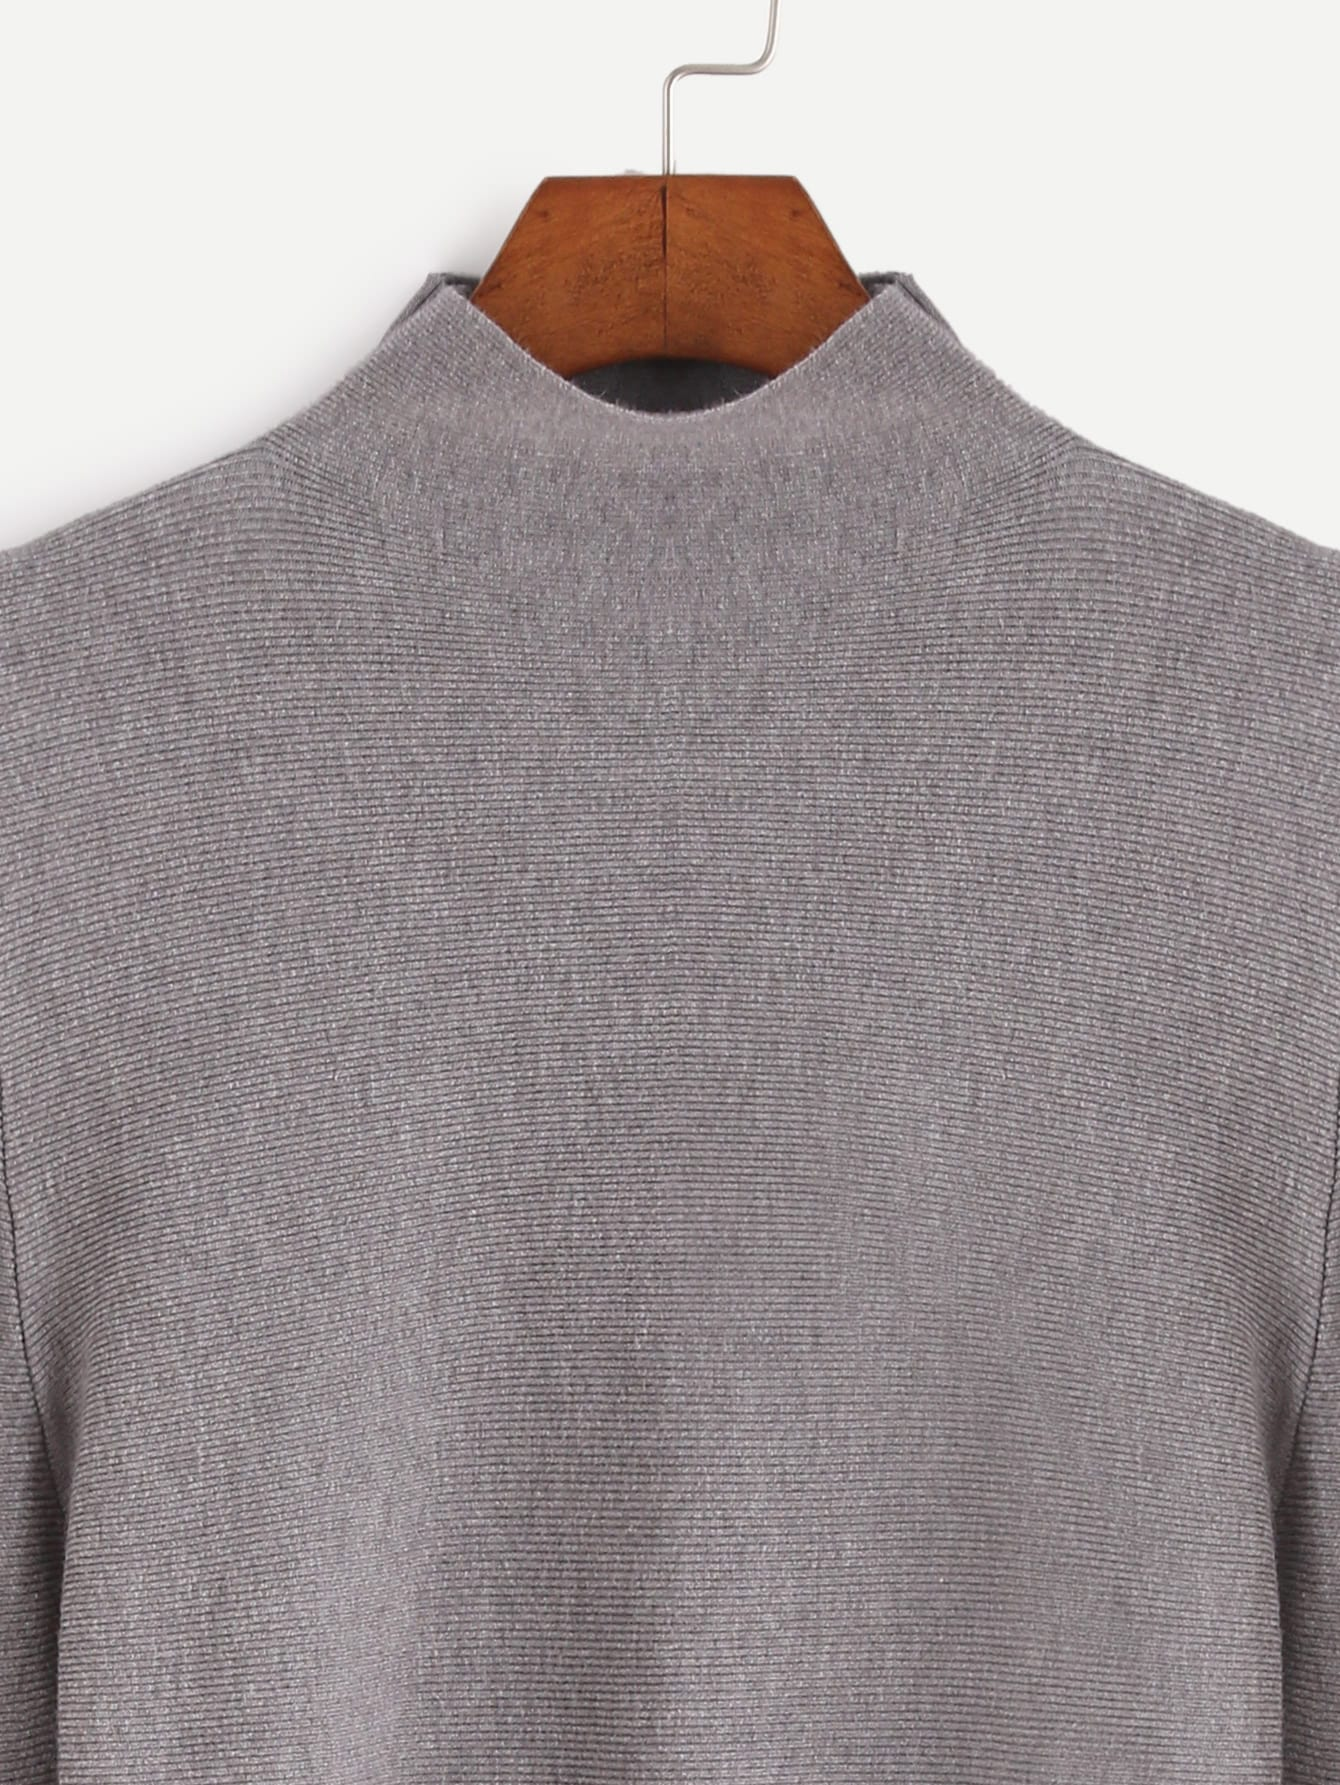 sweater161021002_2